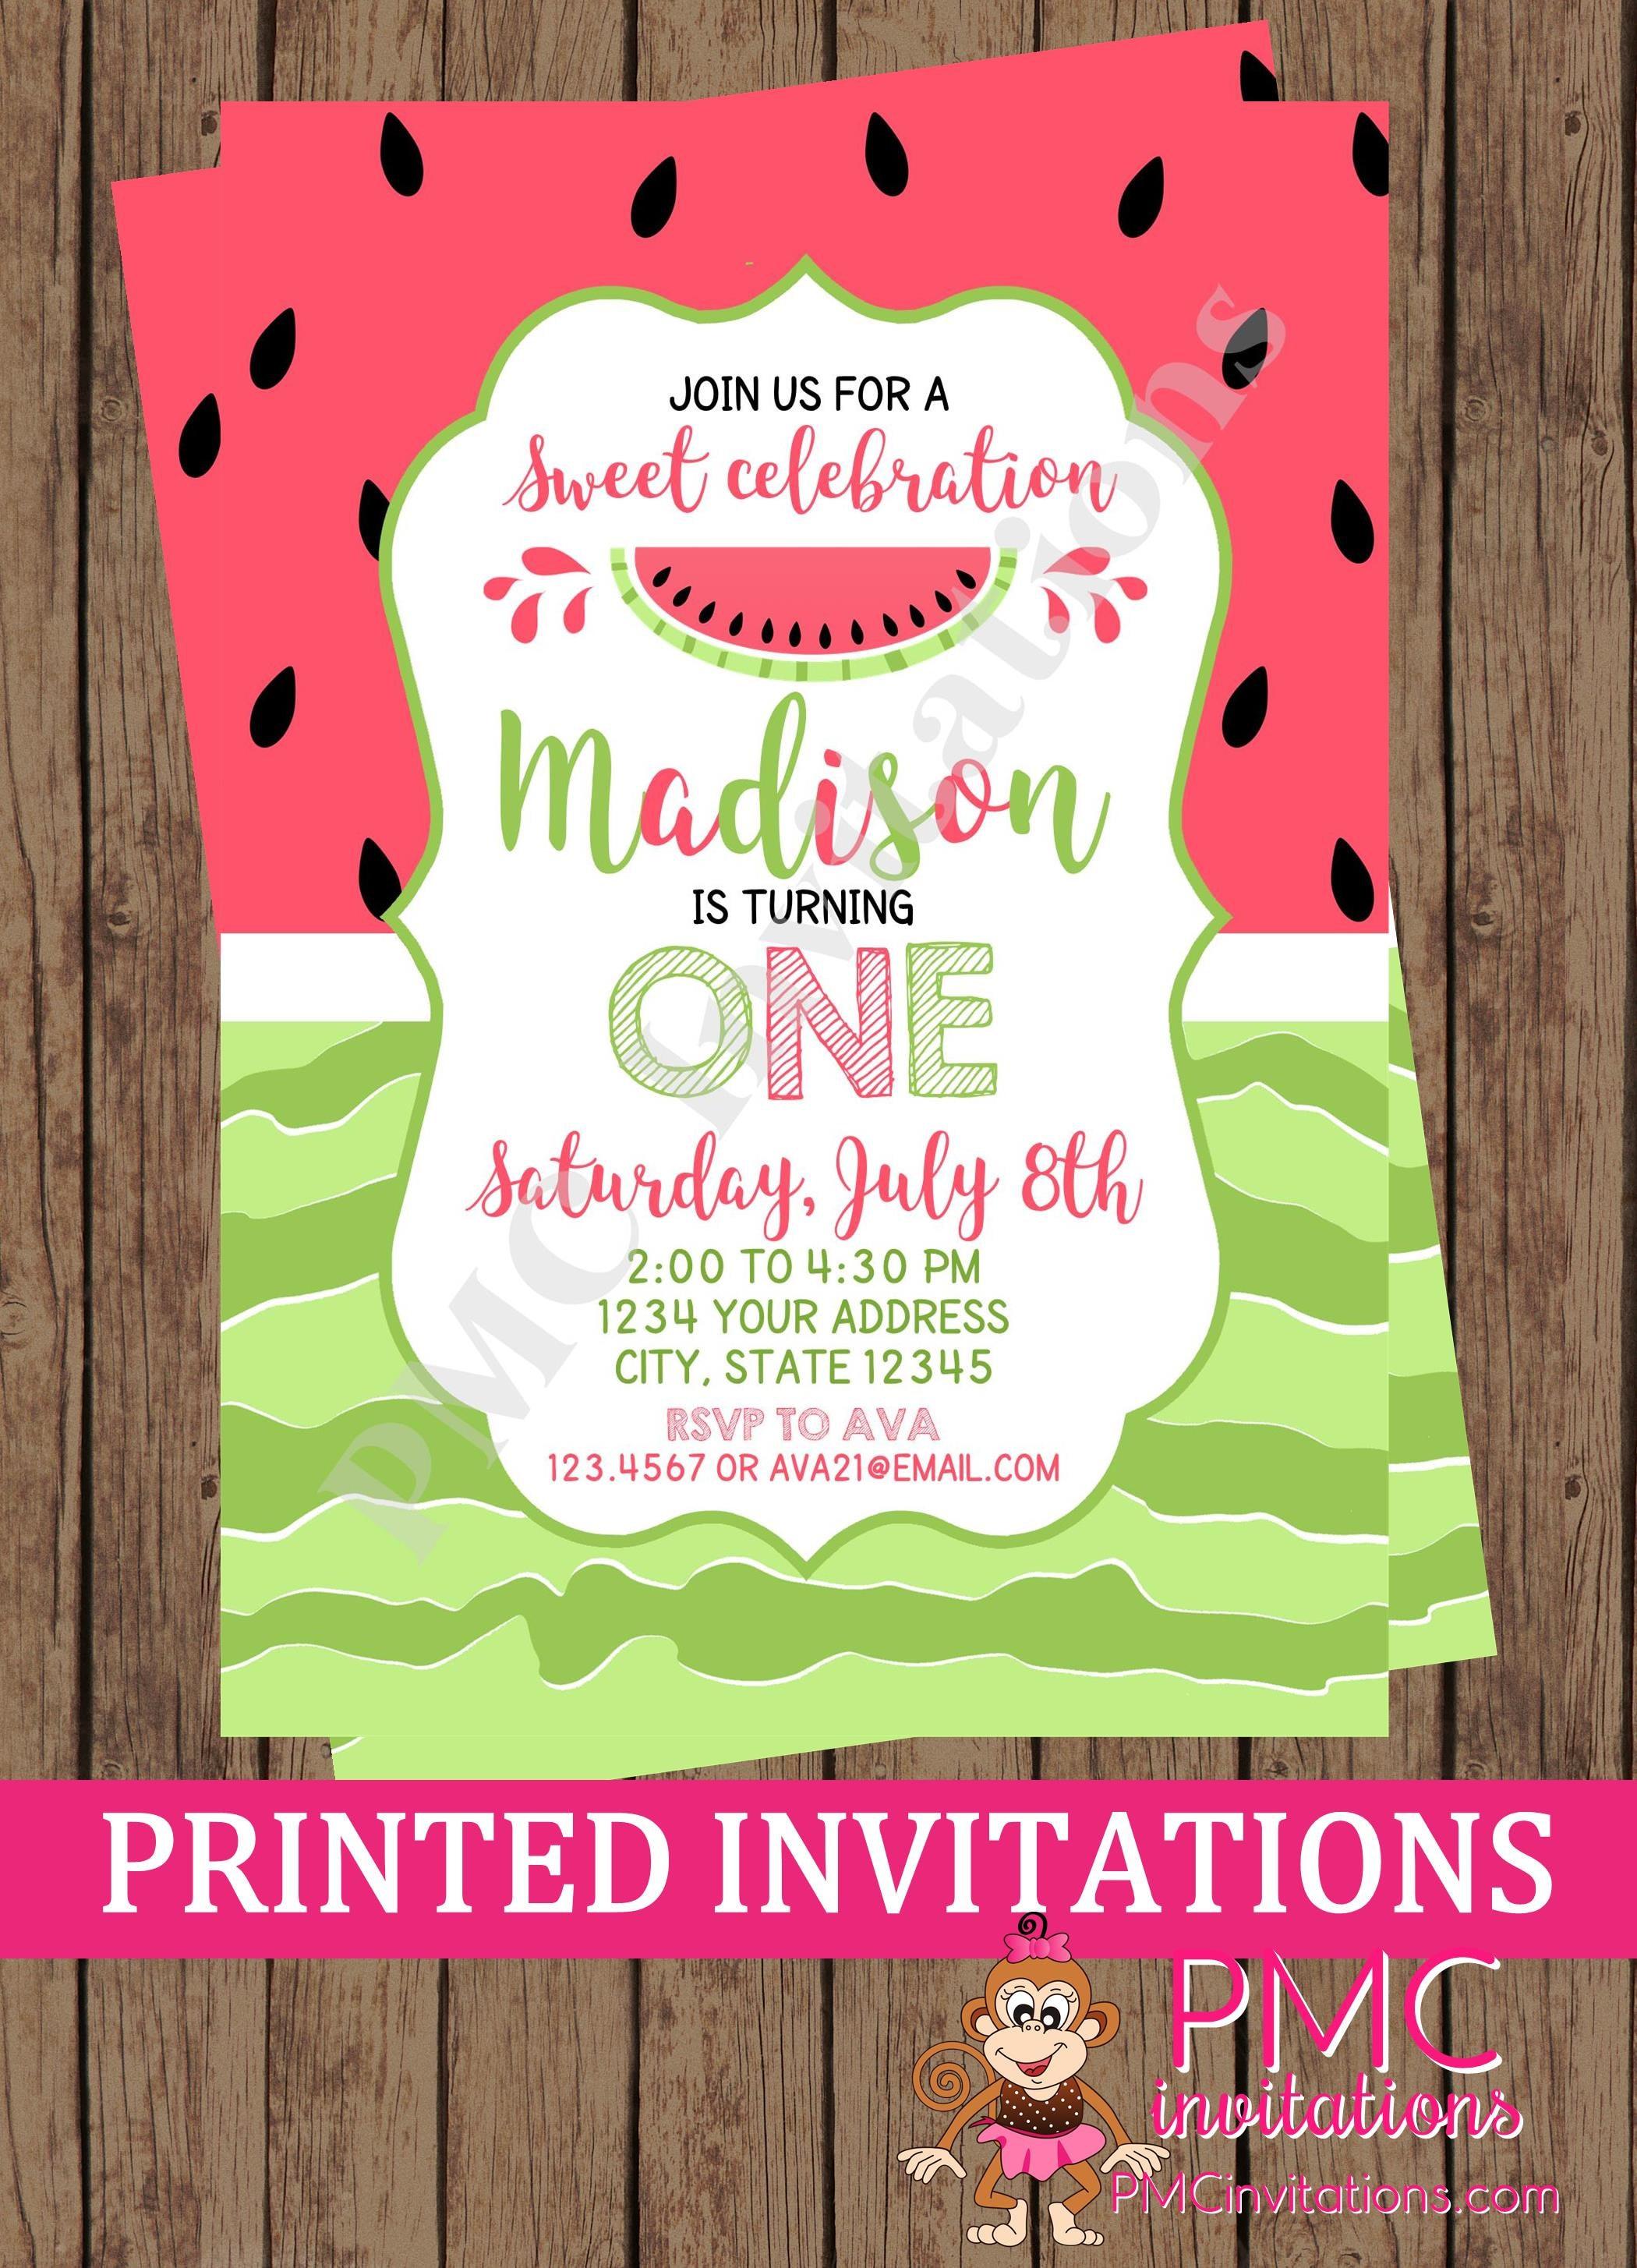 Custom Printed Sweet Watermelon Birthday Invitations